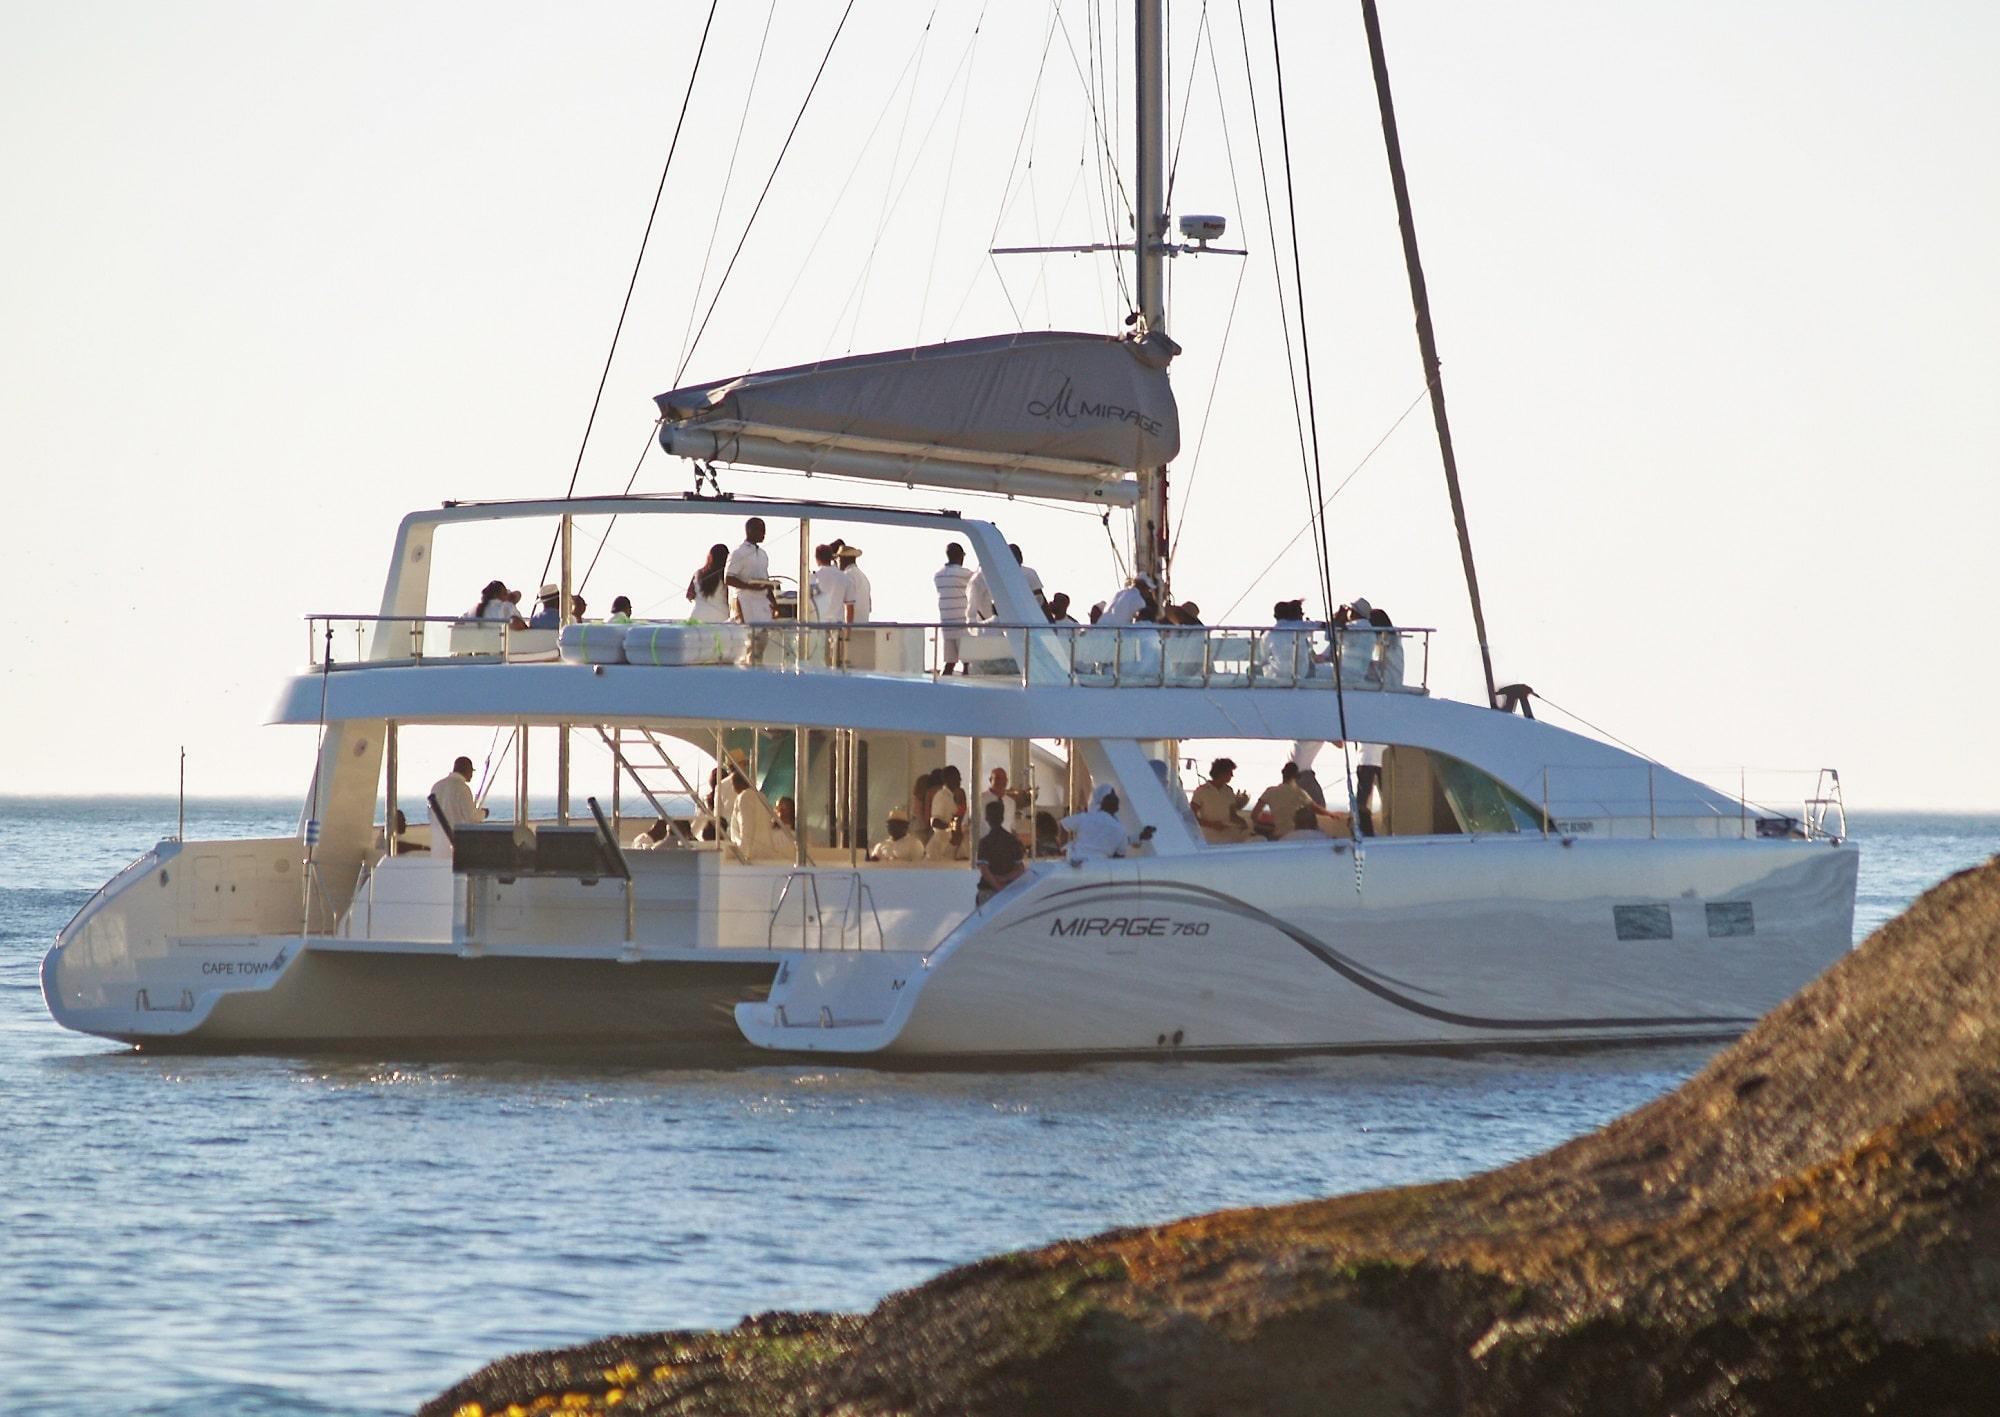 mirage-sail-boat-people-2-min